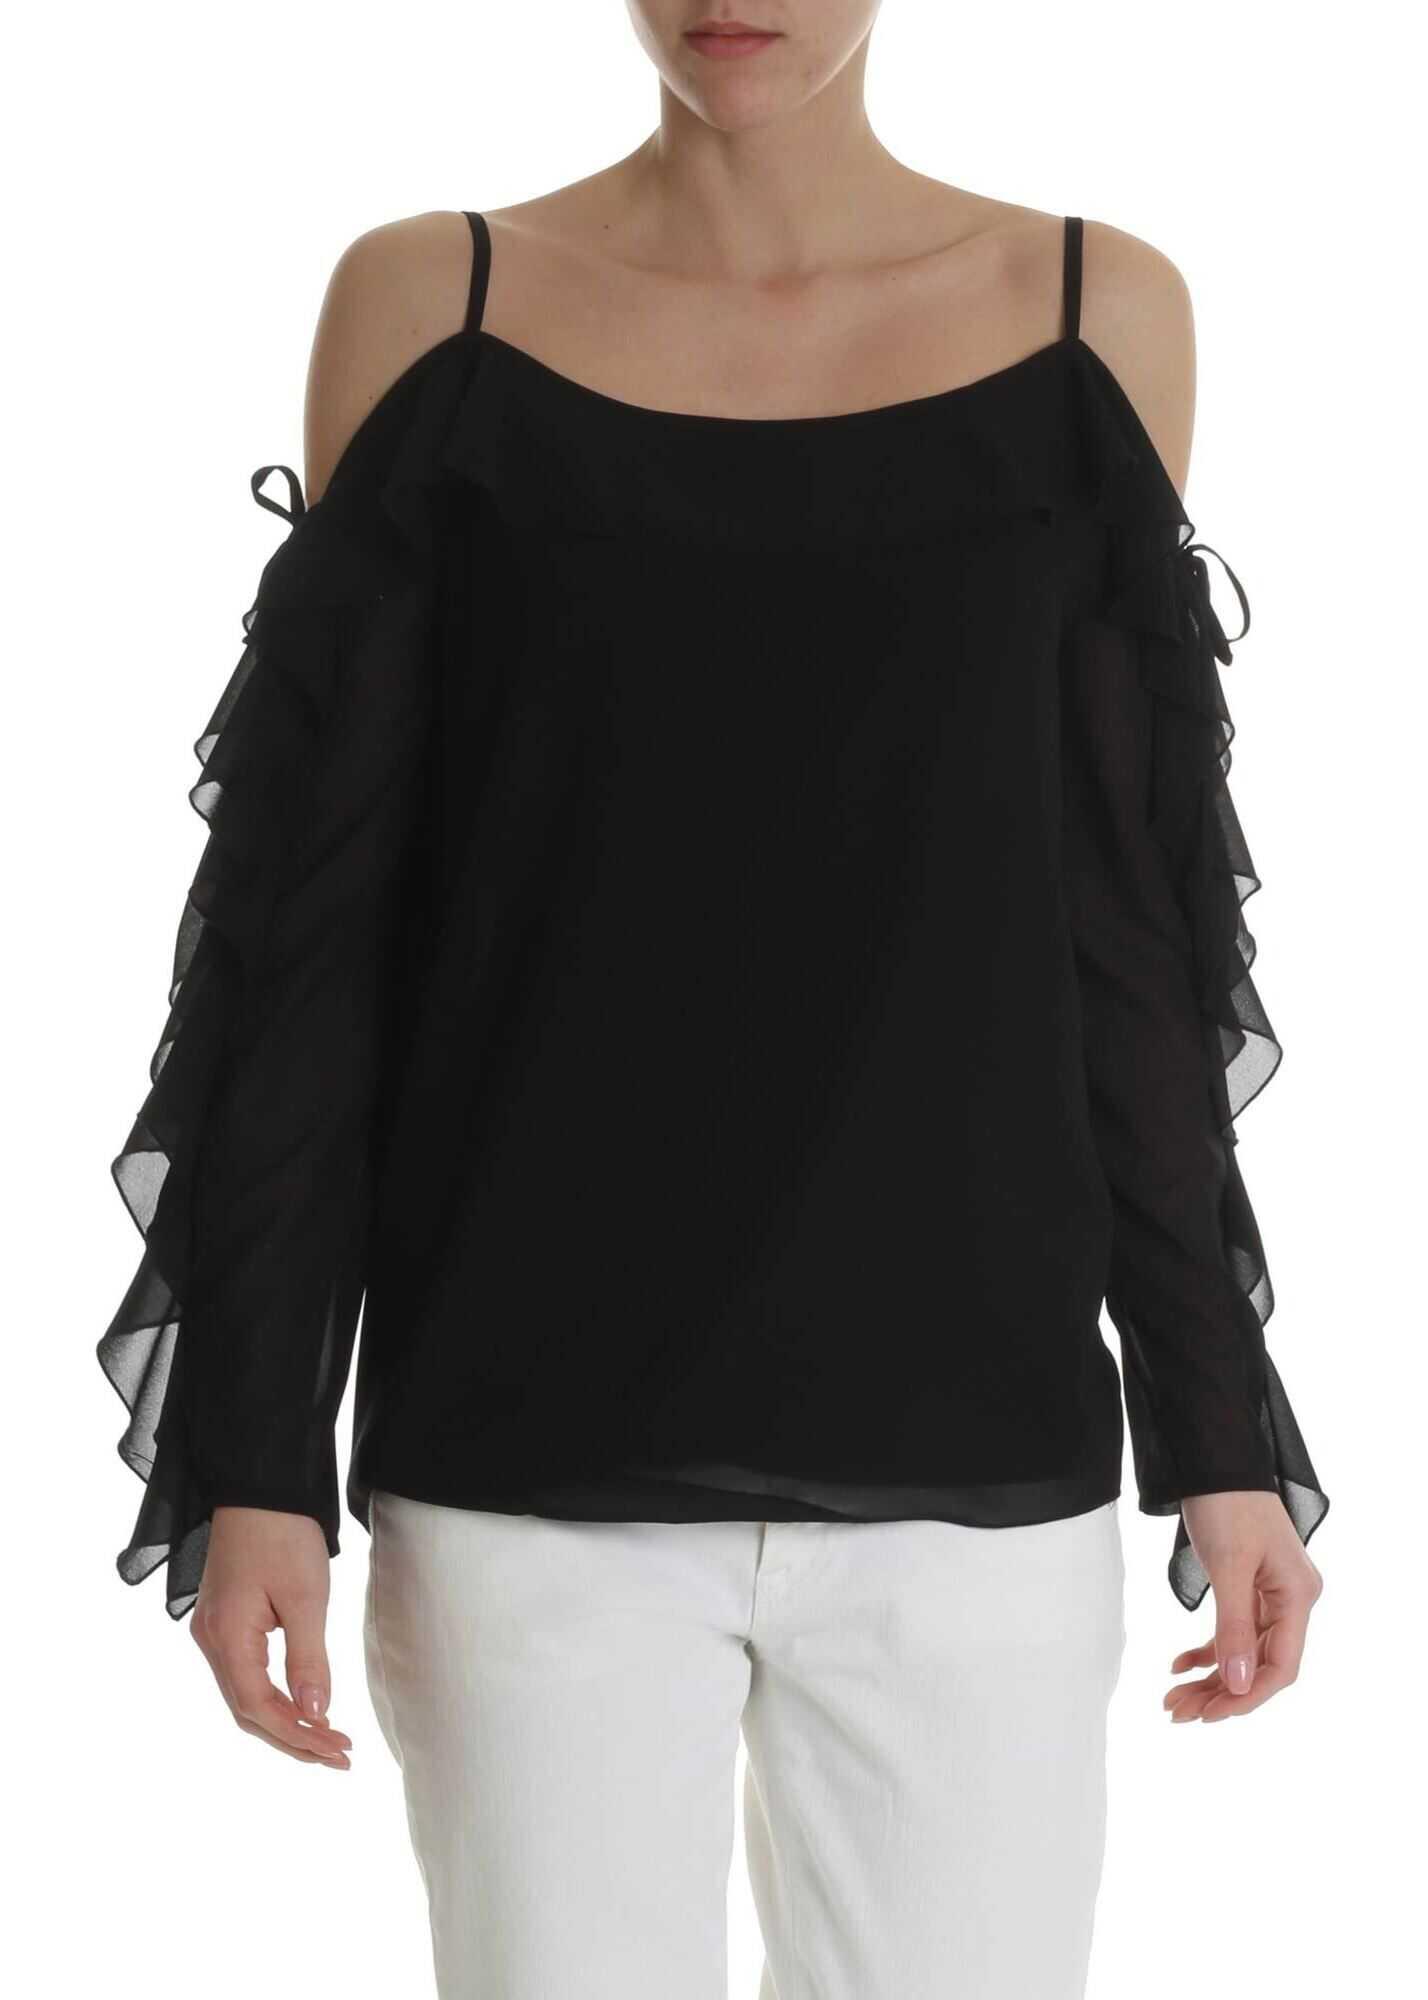 Blugirl Black Off-Shoulder Top With Ruffles Black